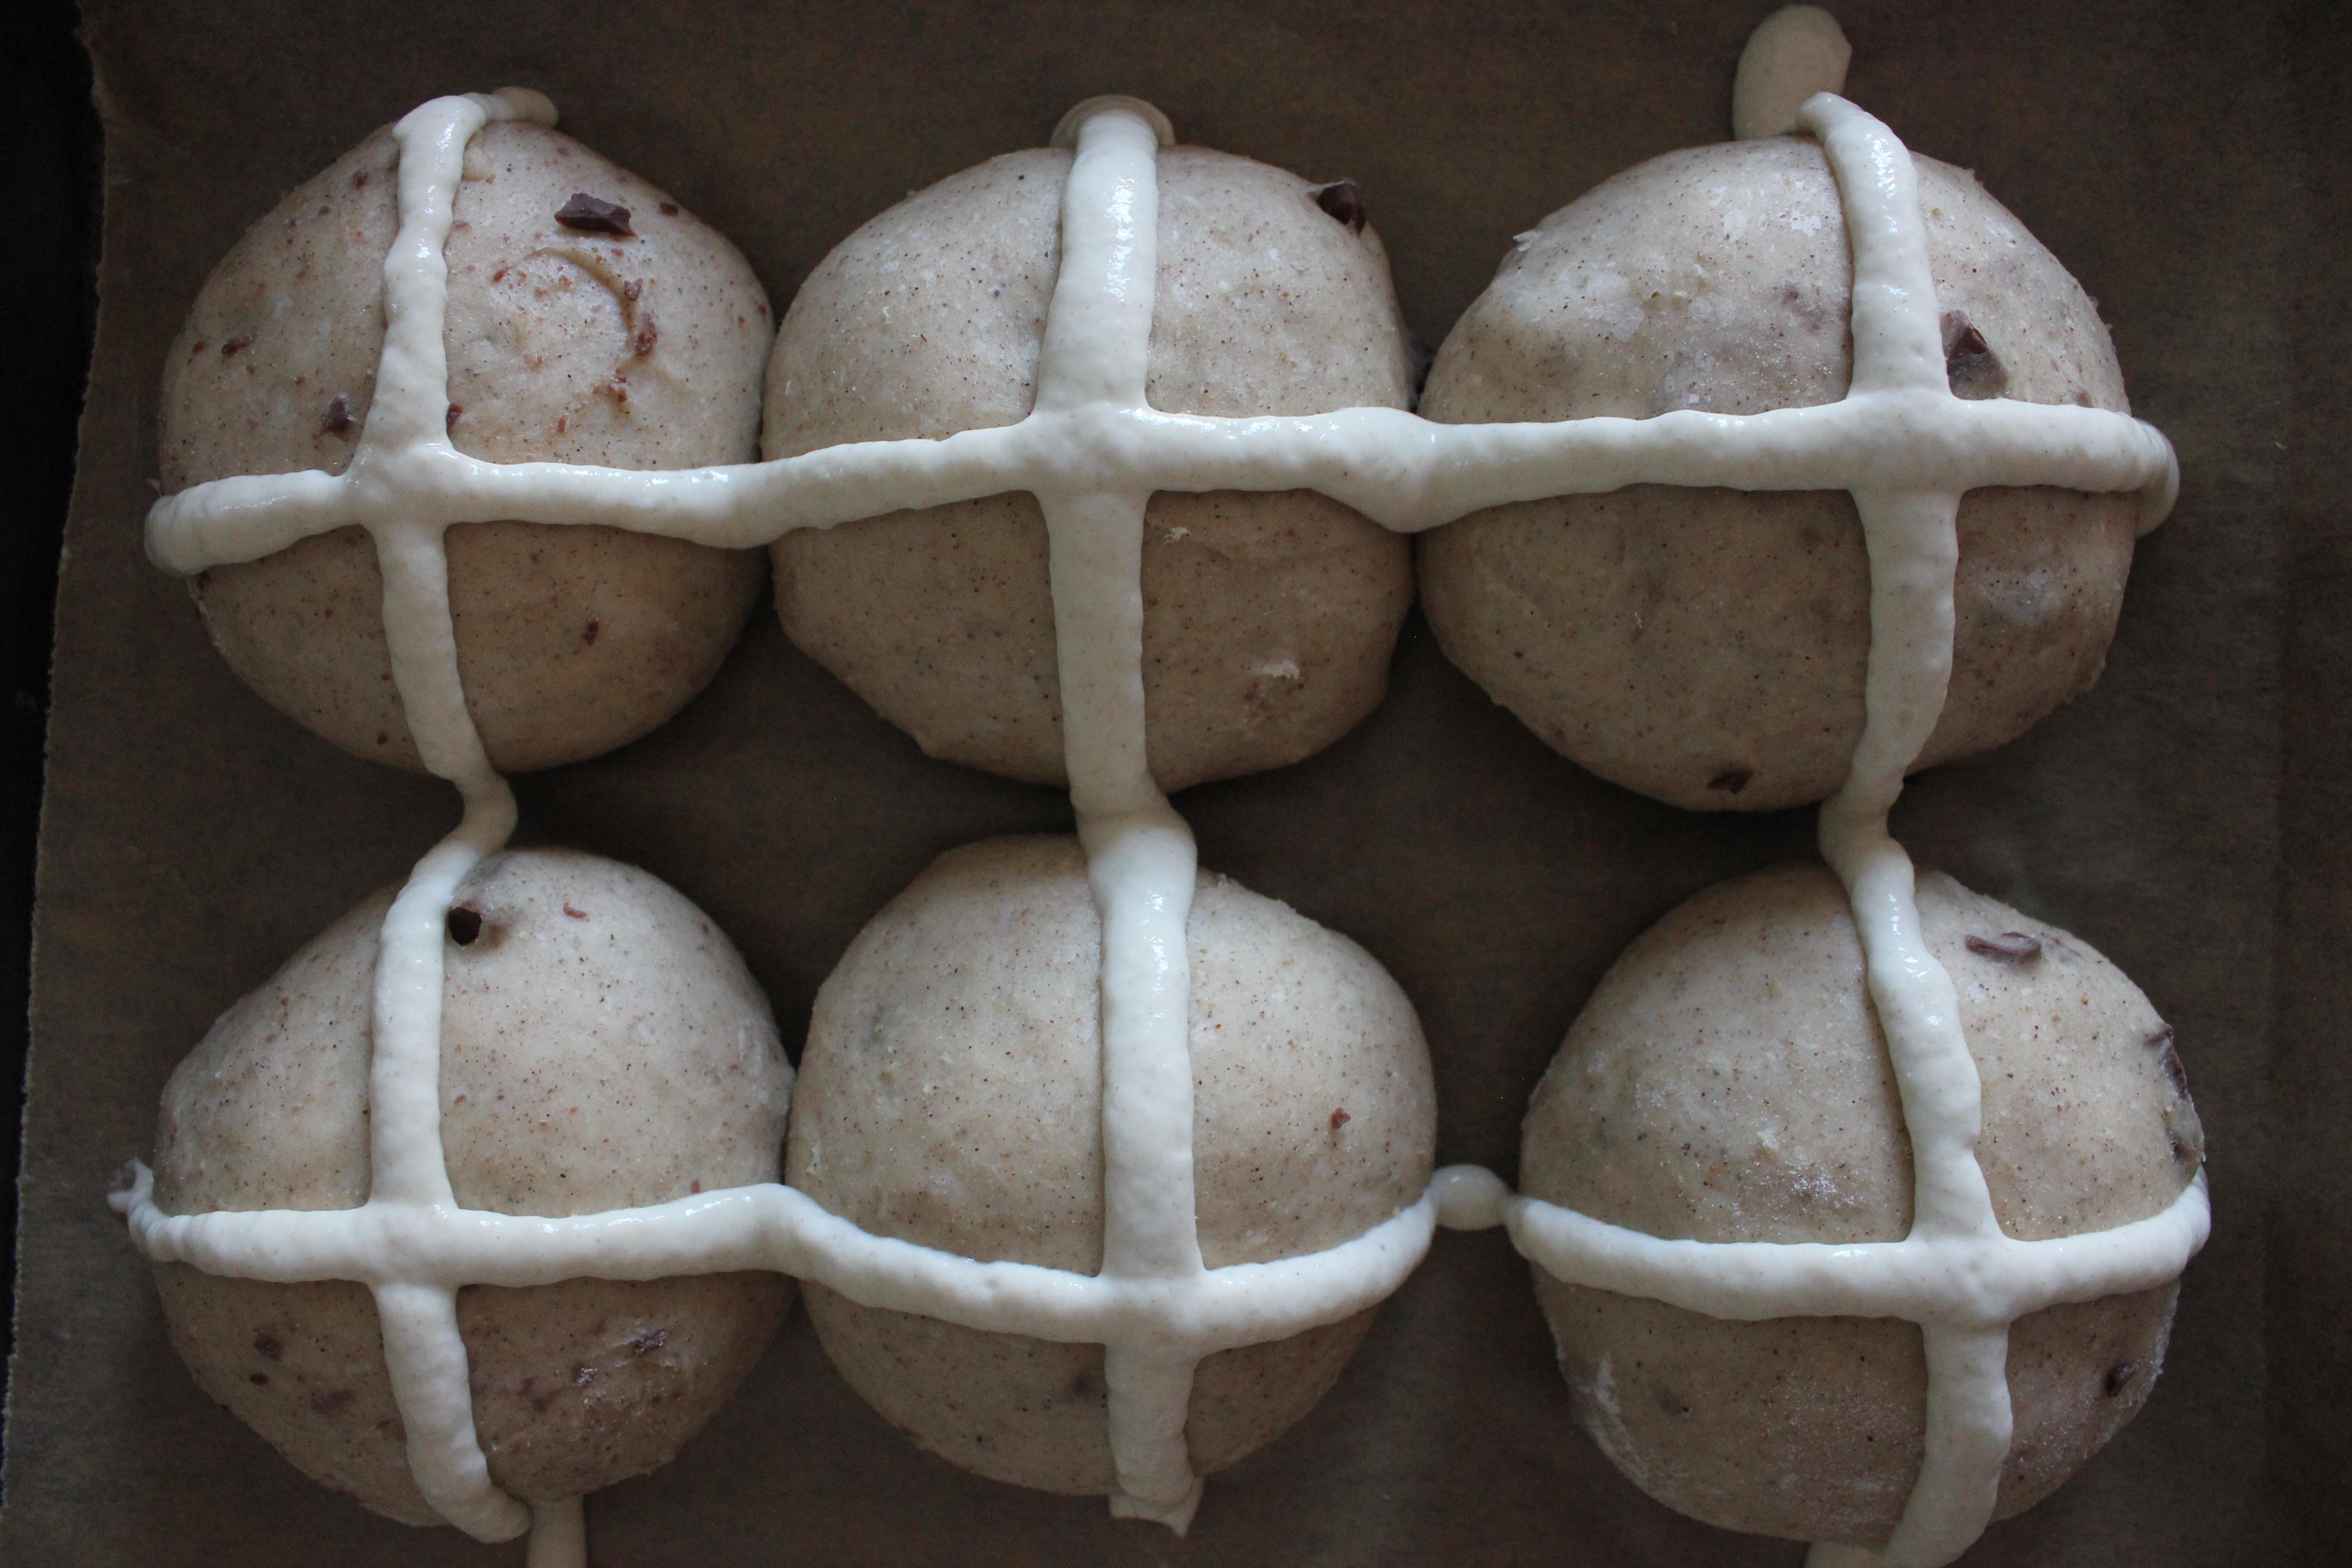 Chocolate and Cardamom Hot Cross Buns